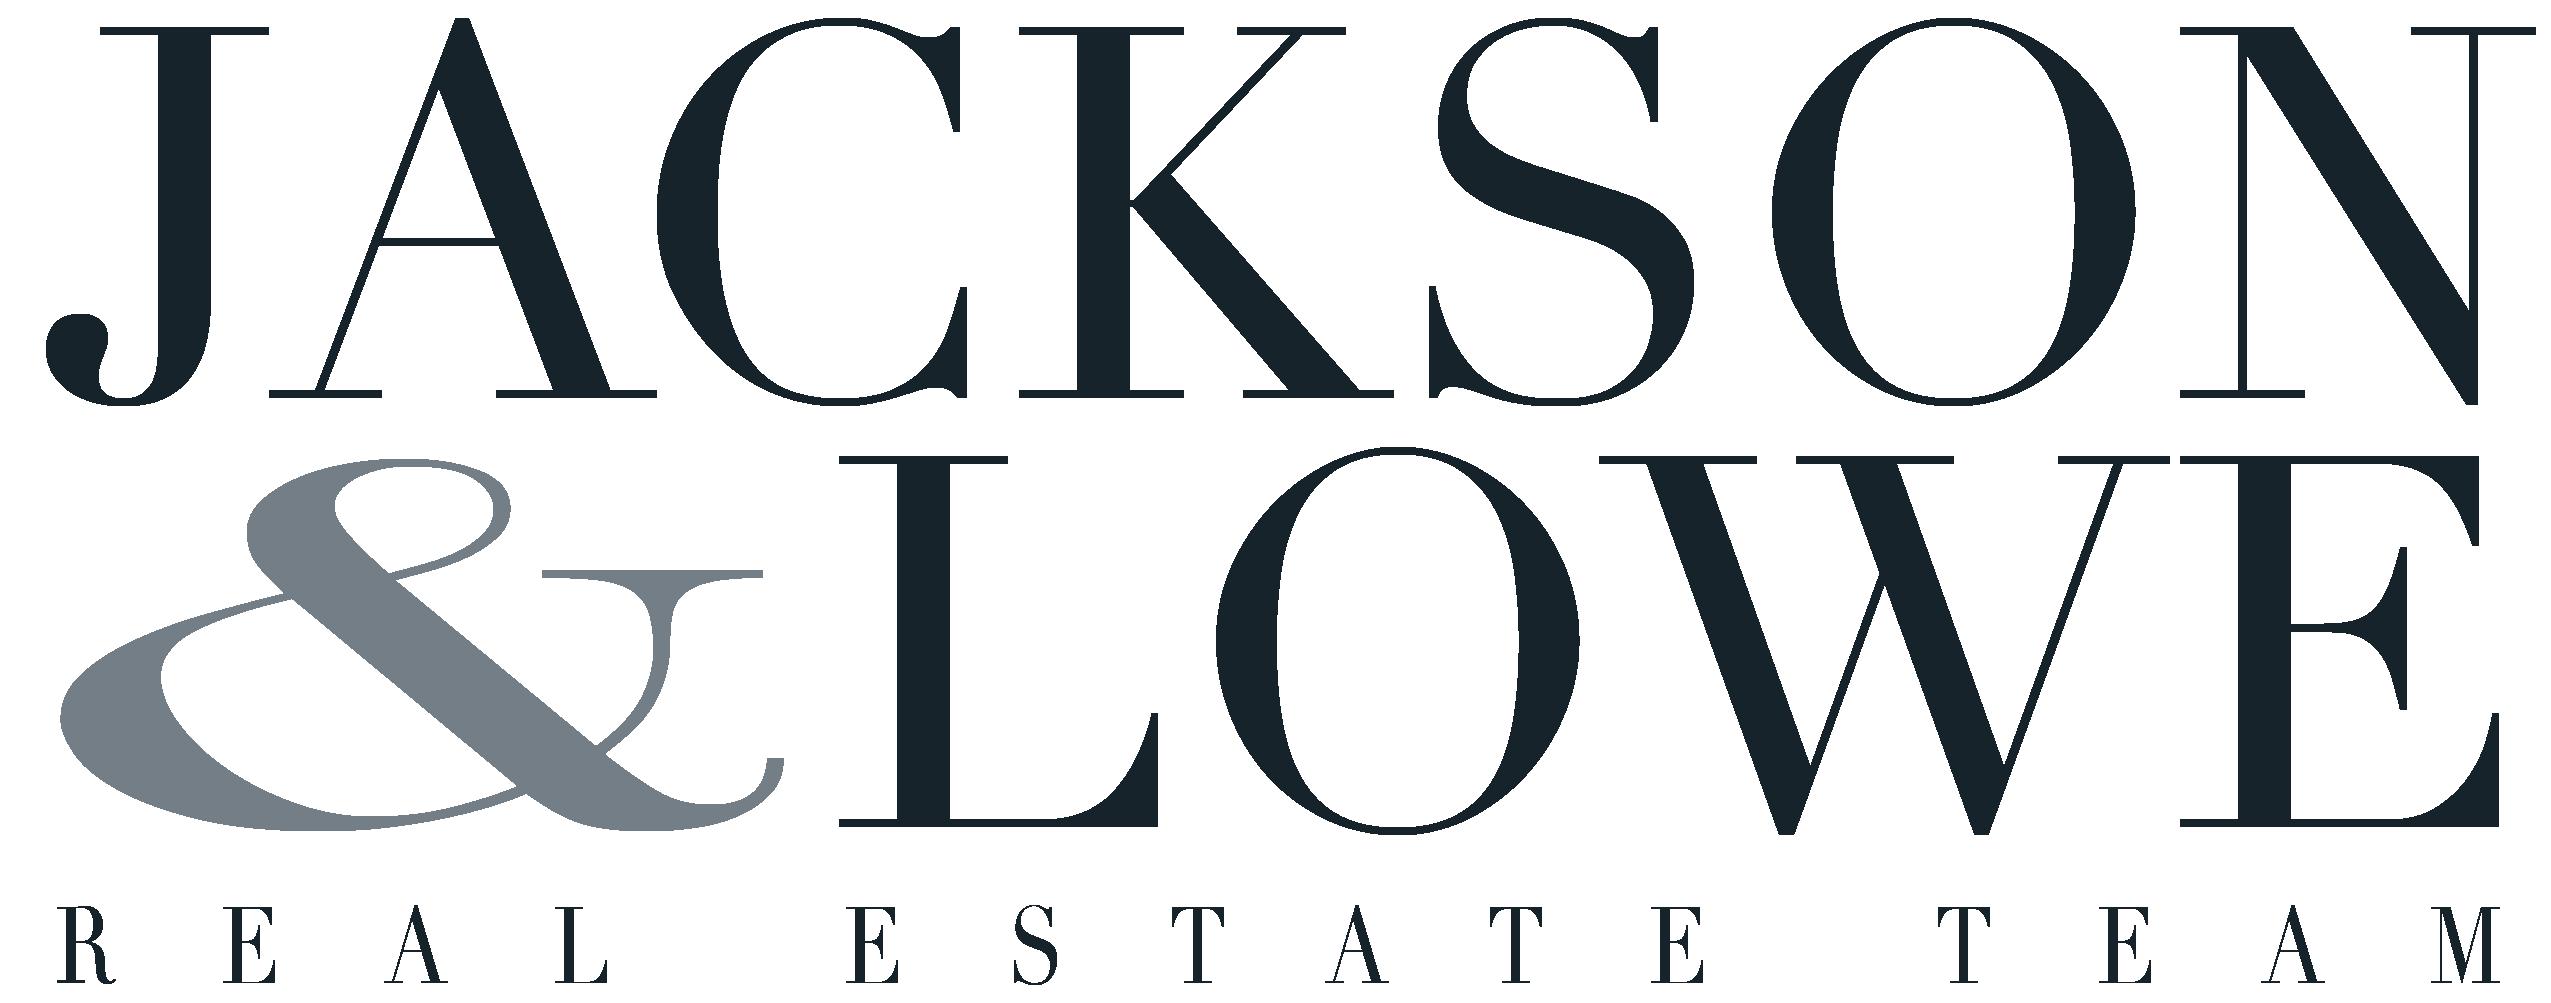 Jackson Lowe-Lrg_logo-Print